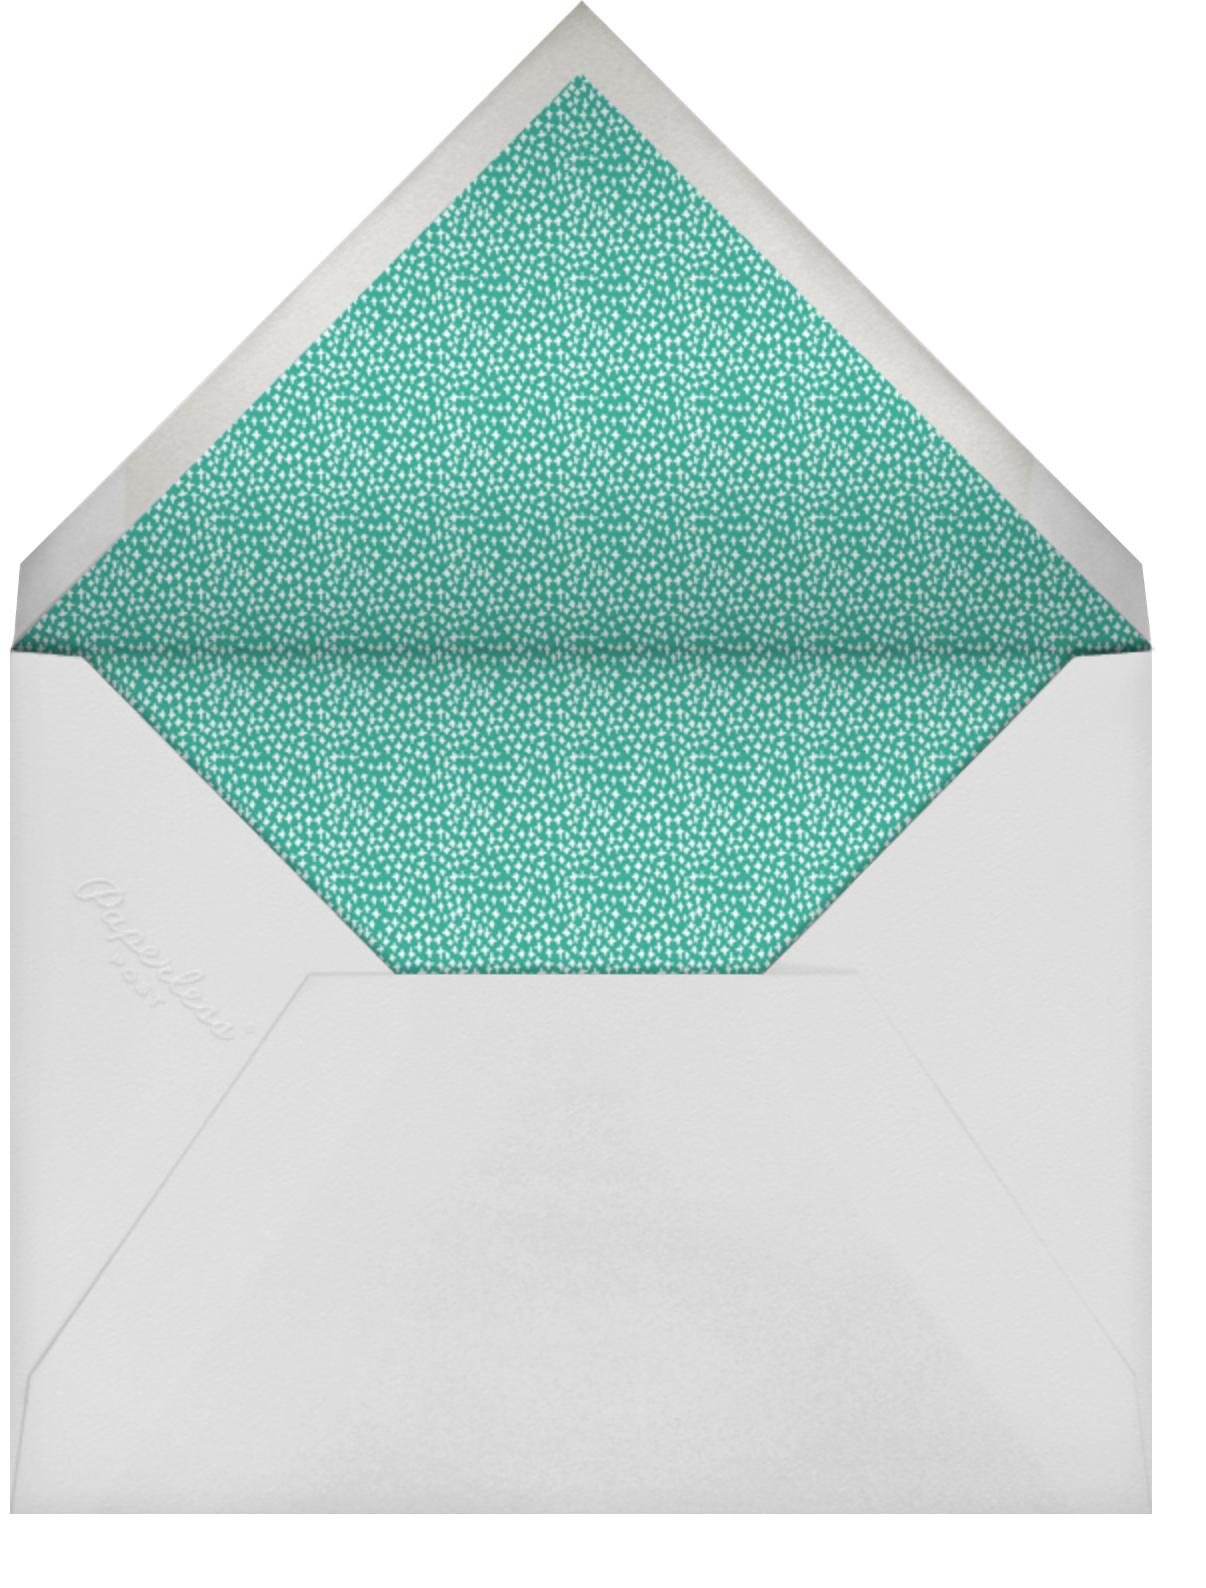 Pine and Dandy - White - Mr. Boddington's Studio - Adult birthday - envelope back